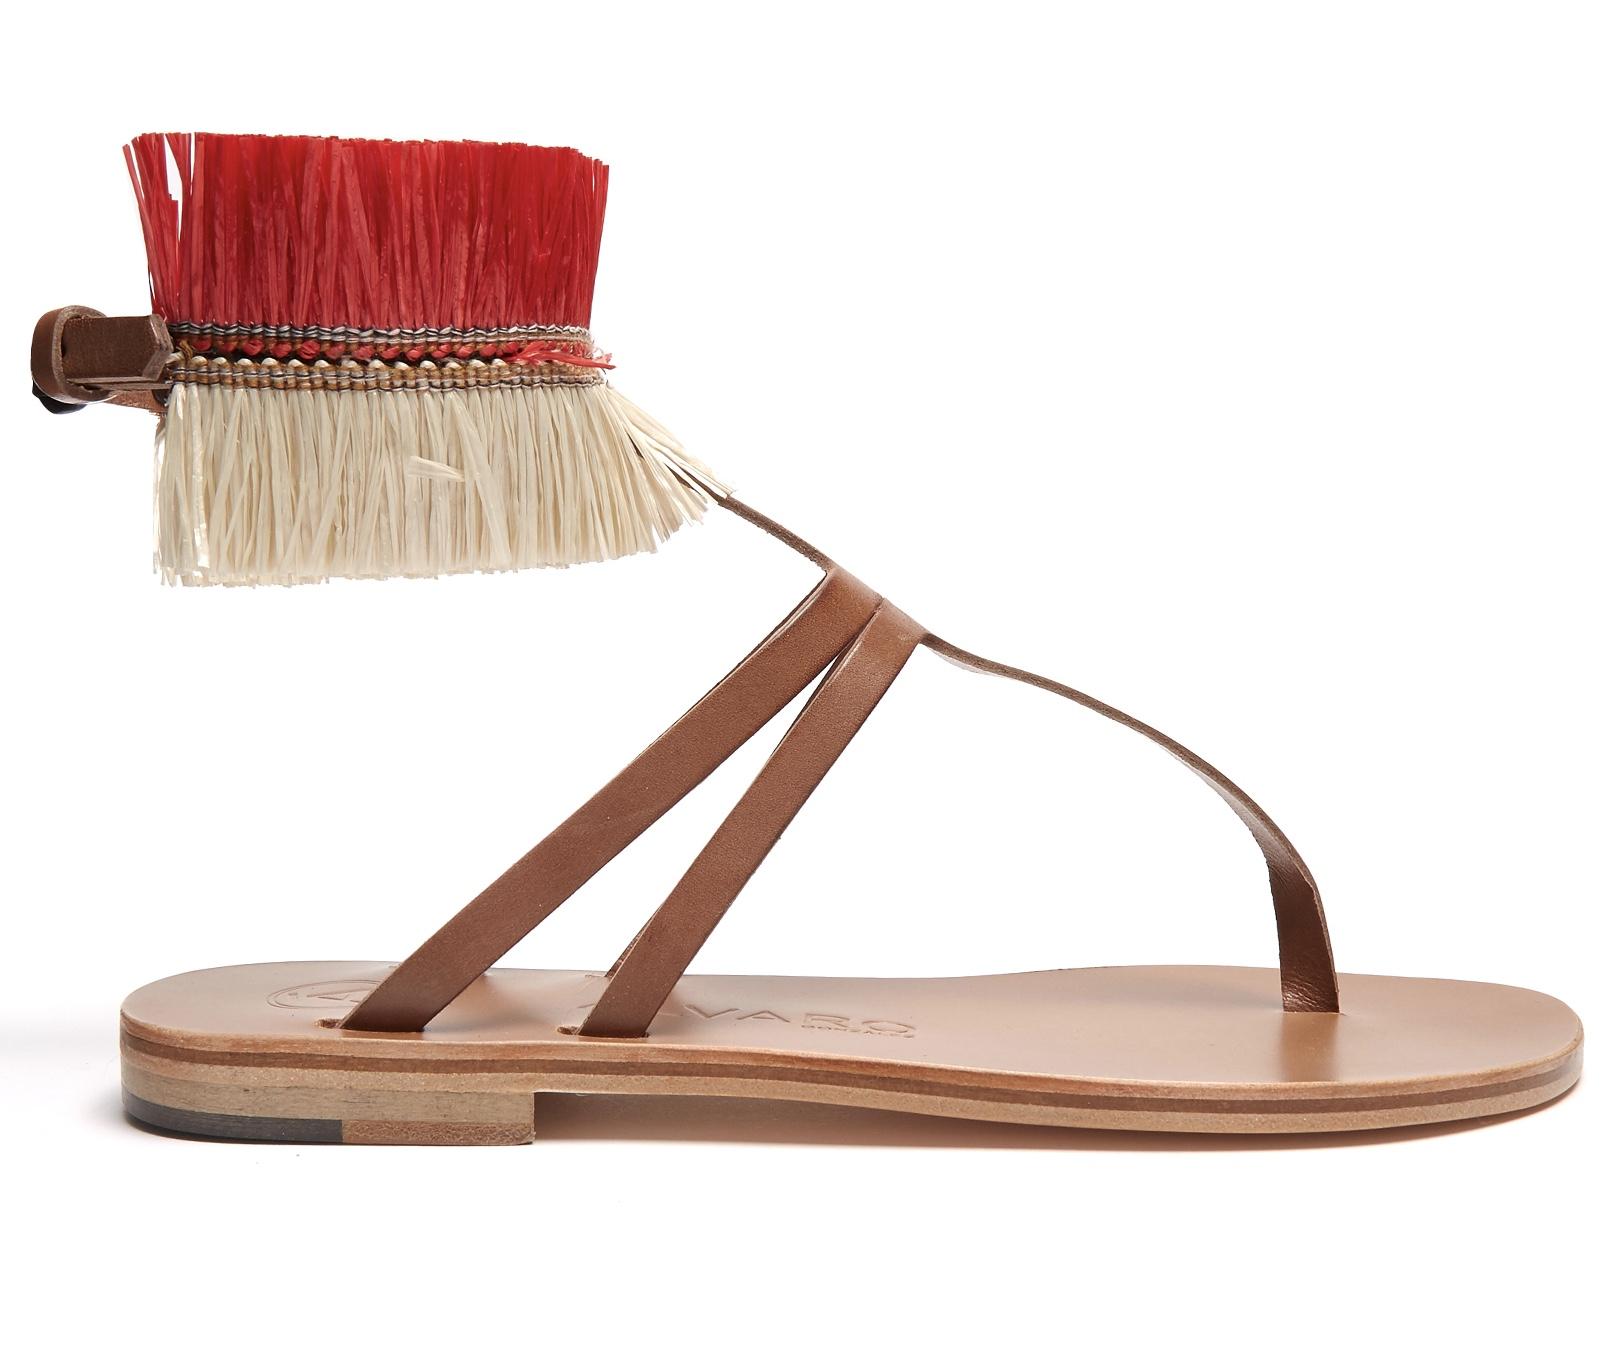 Álvaro Arianna rafia-embellished leather sandals